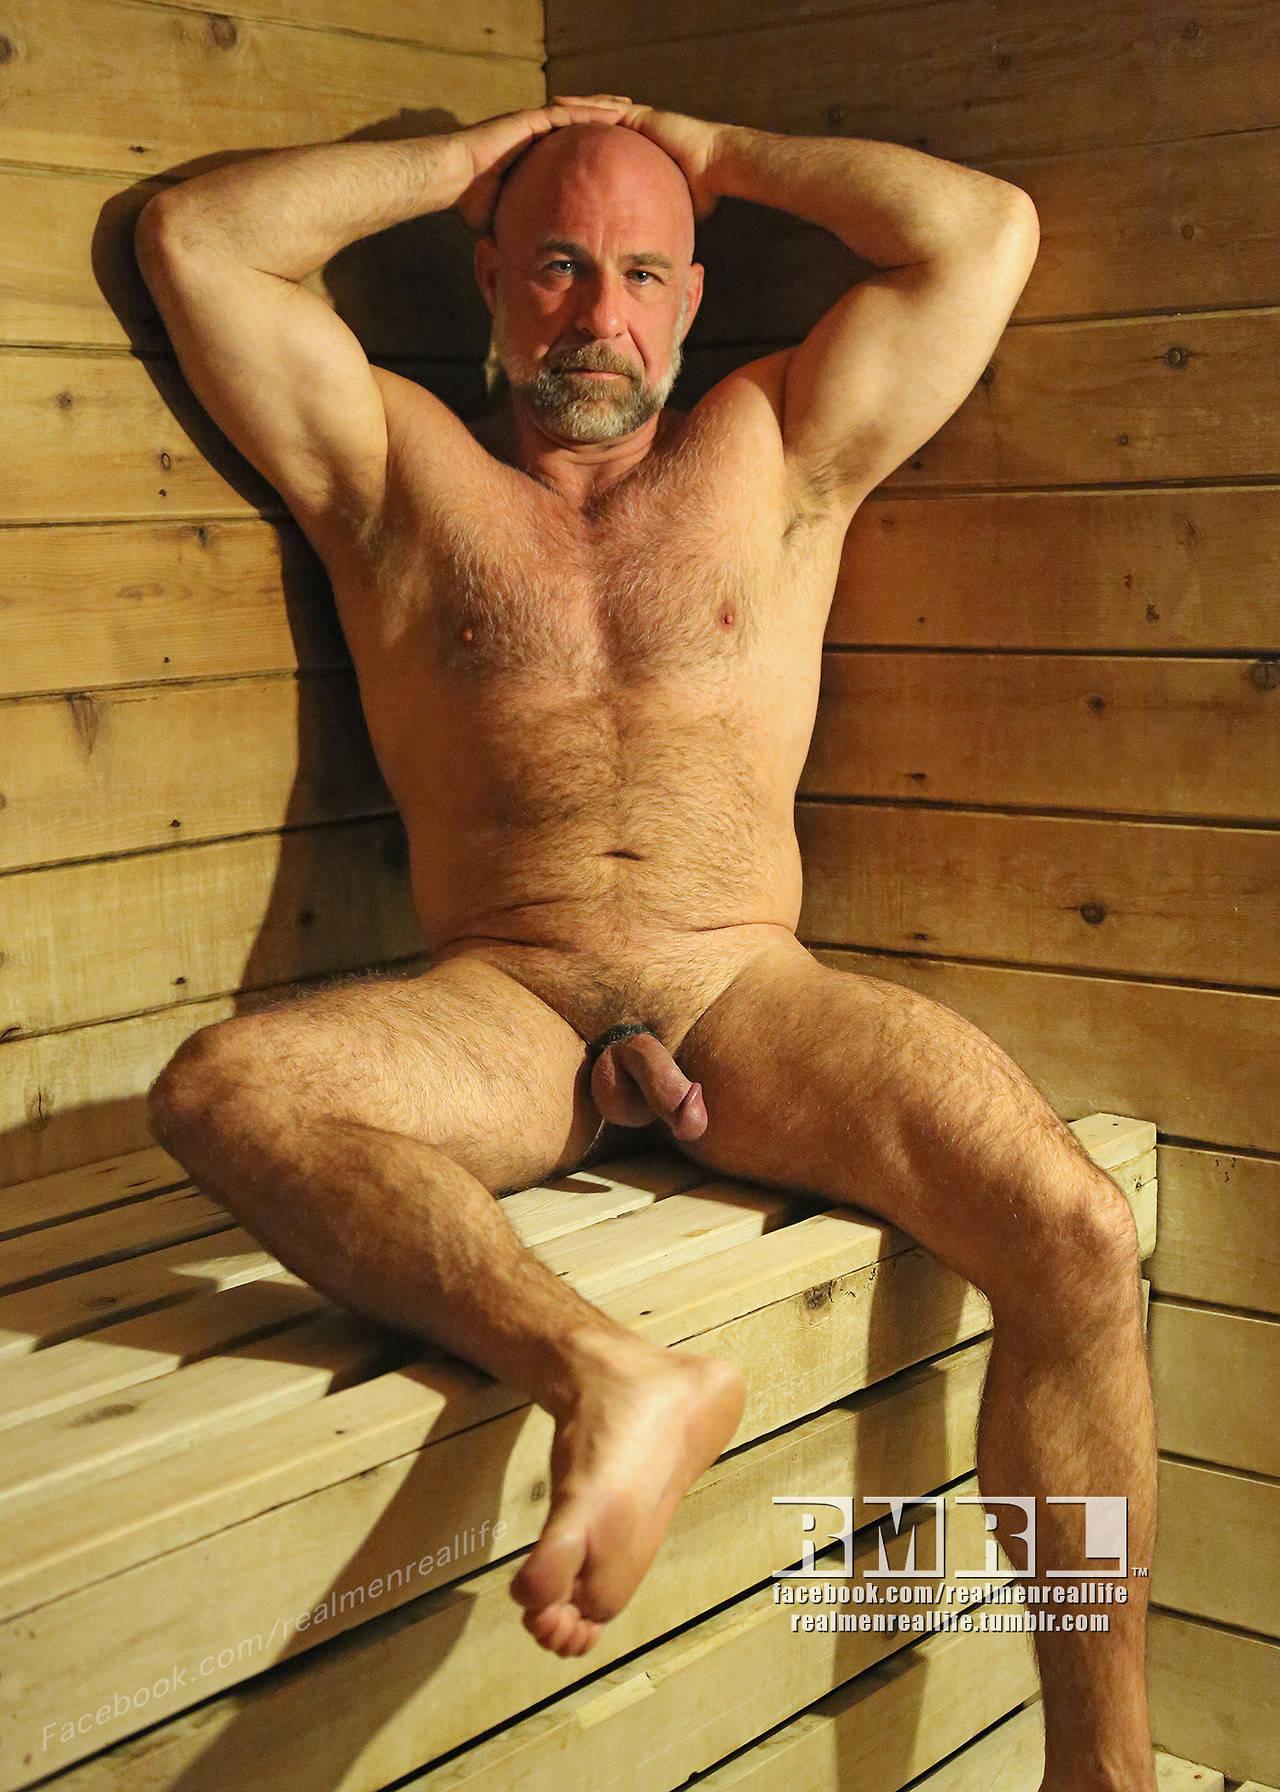 Ummmm Wow Doug Realmenreallife Daily Squirt-3387